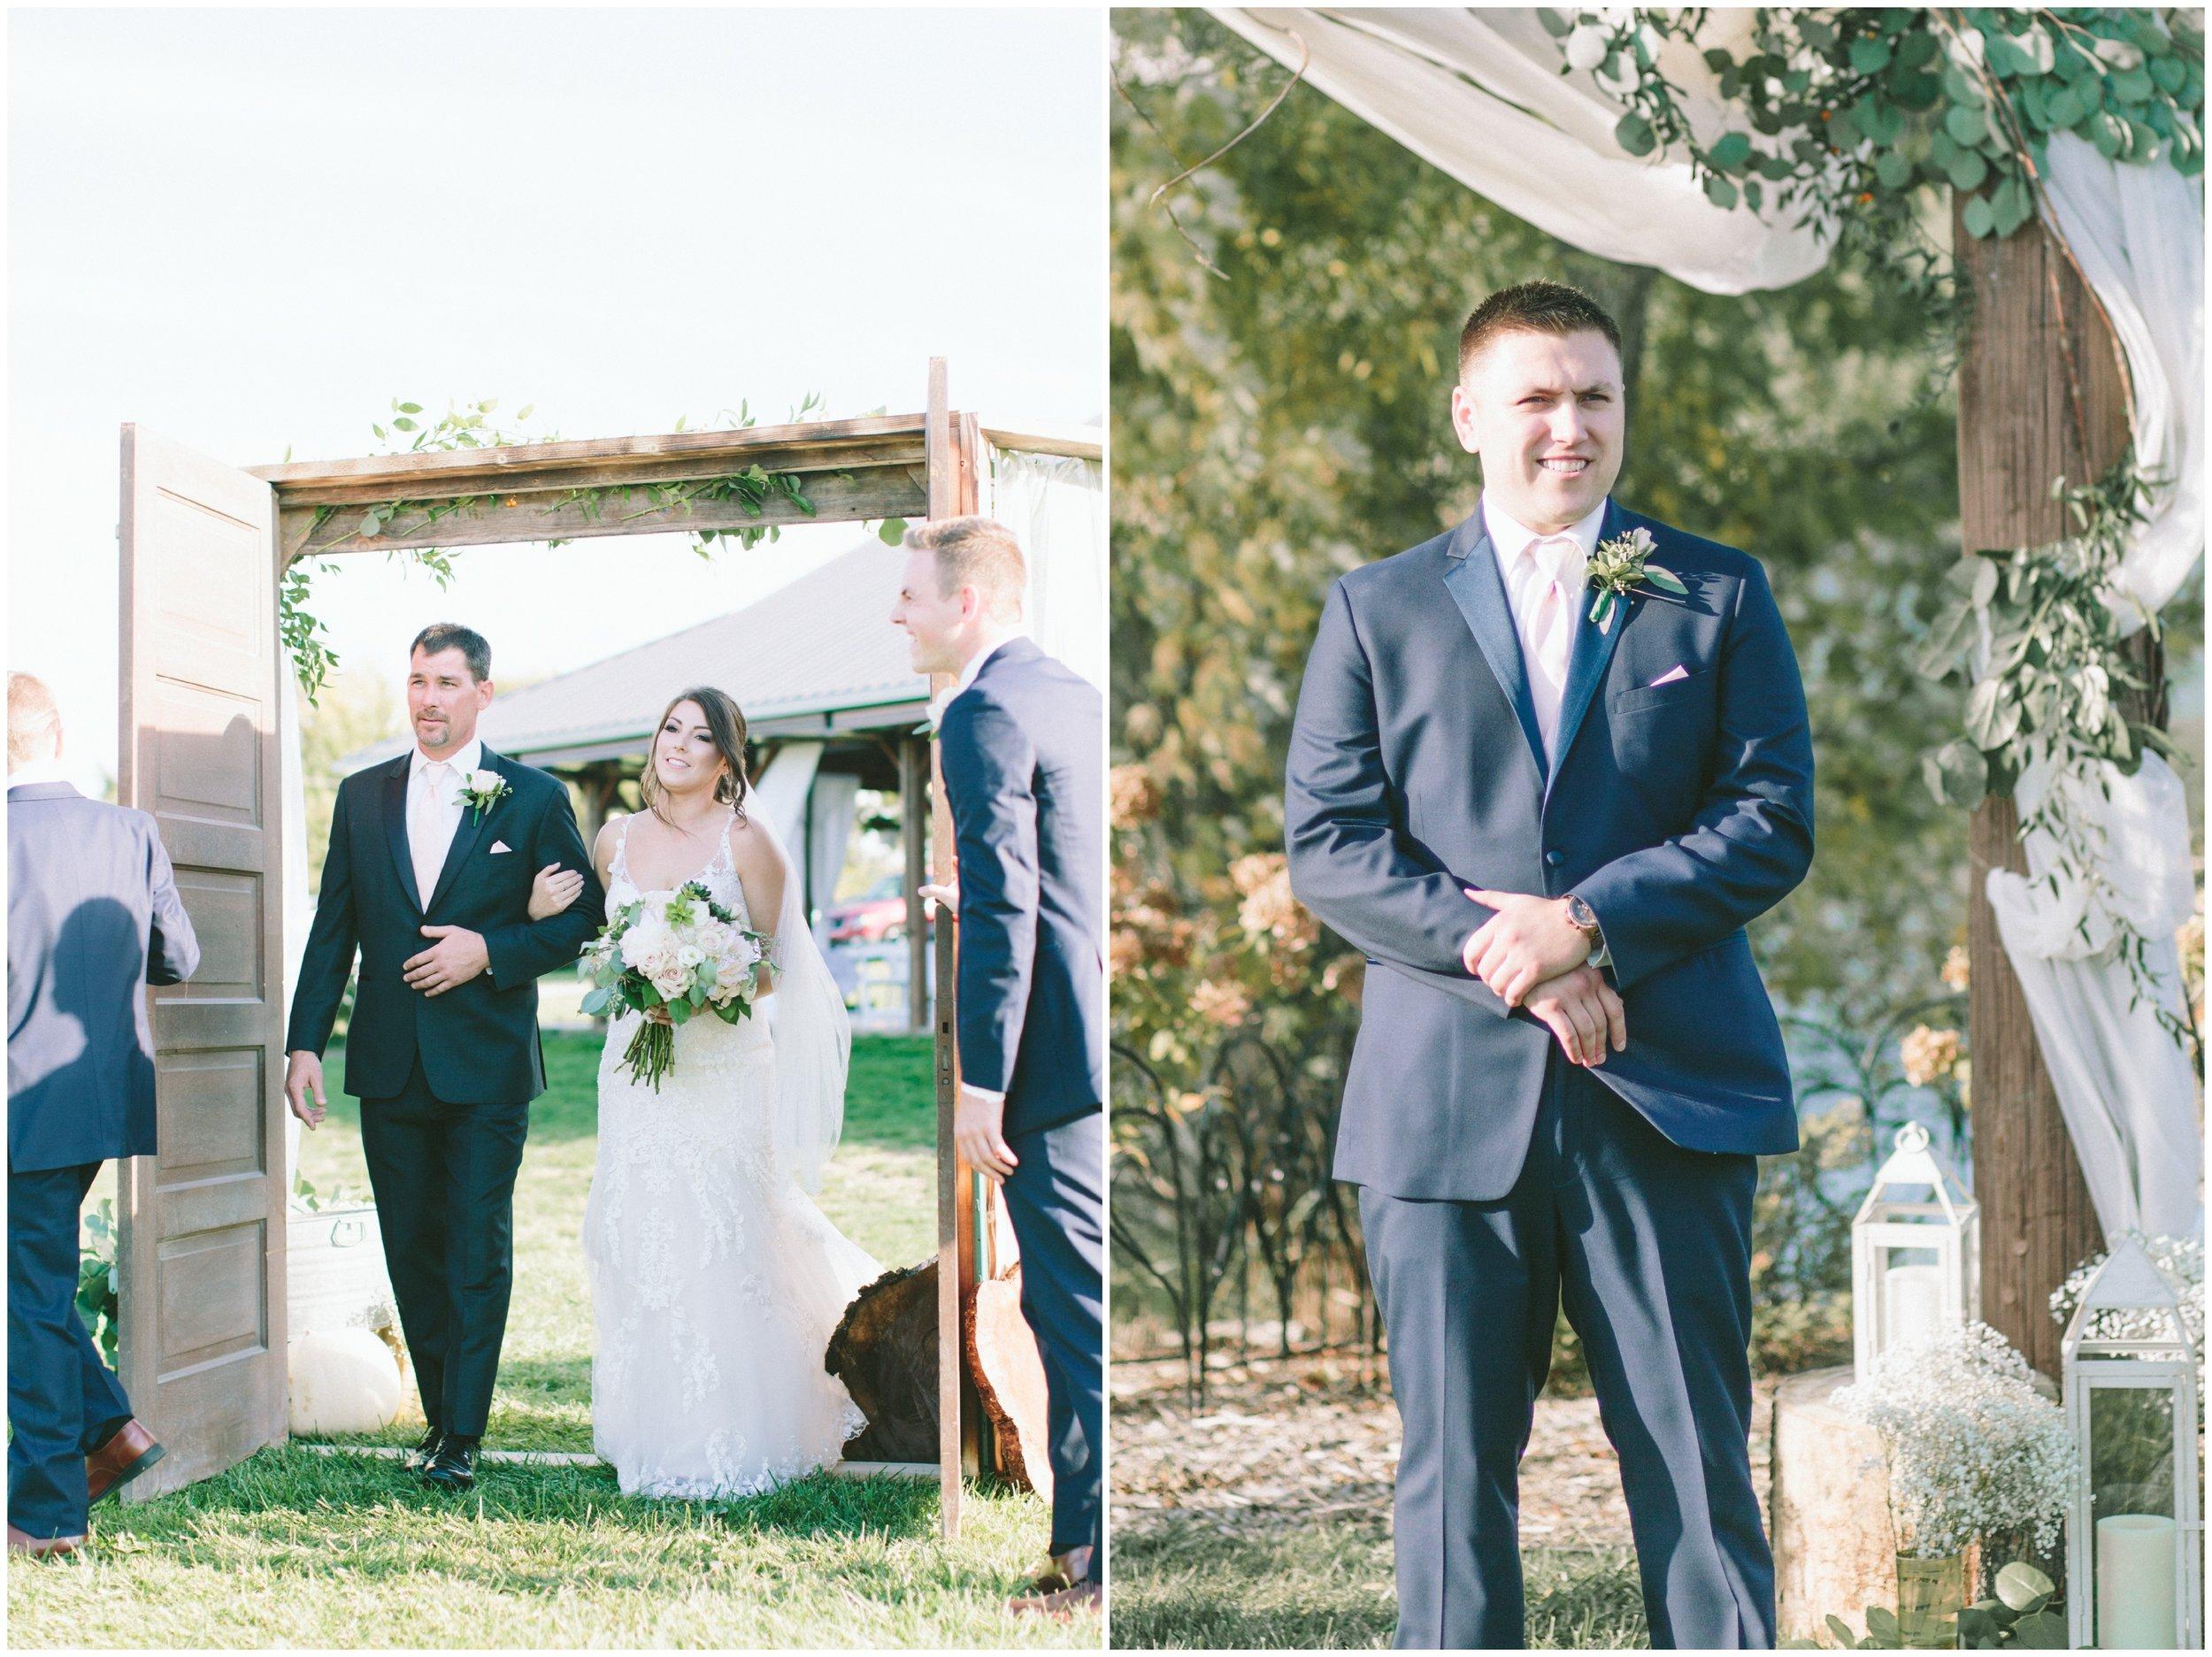 Indiana Wedding 68.JPG